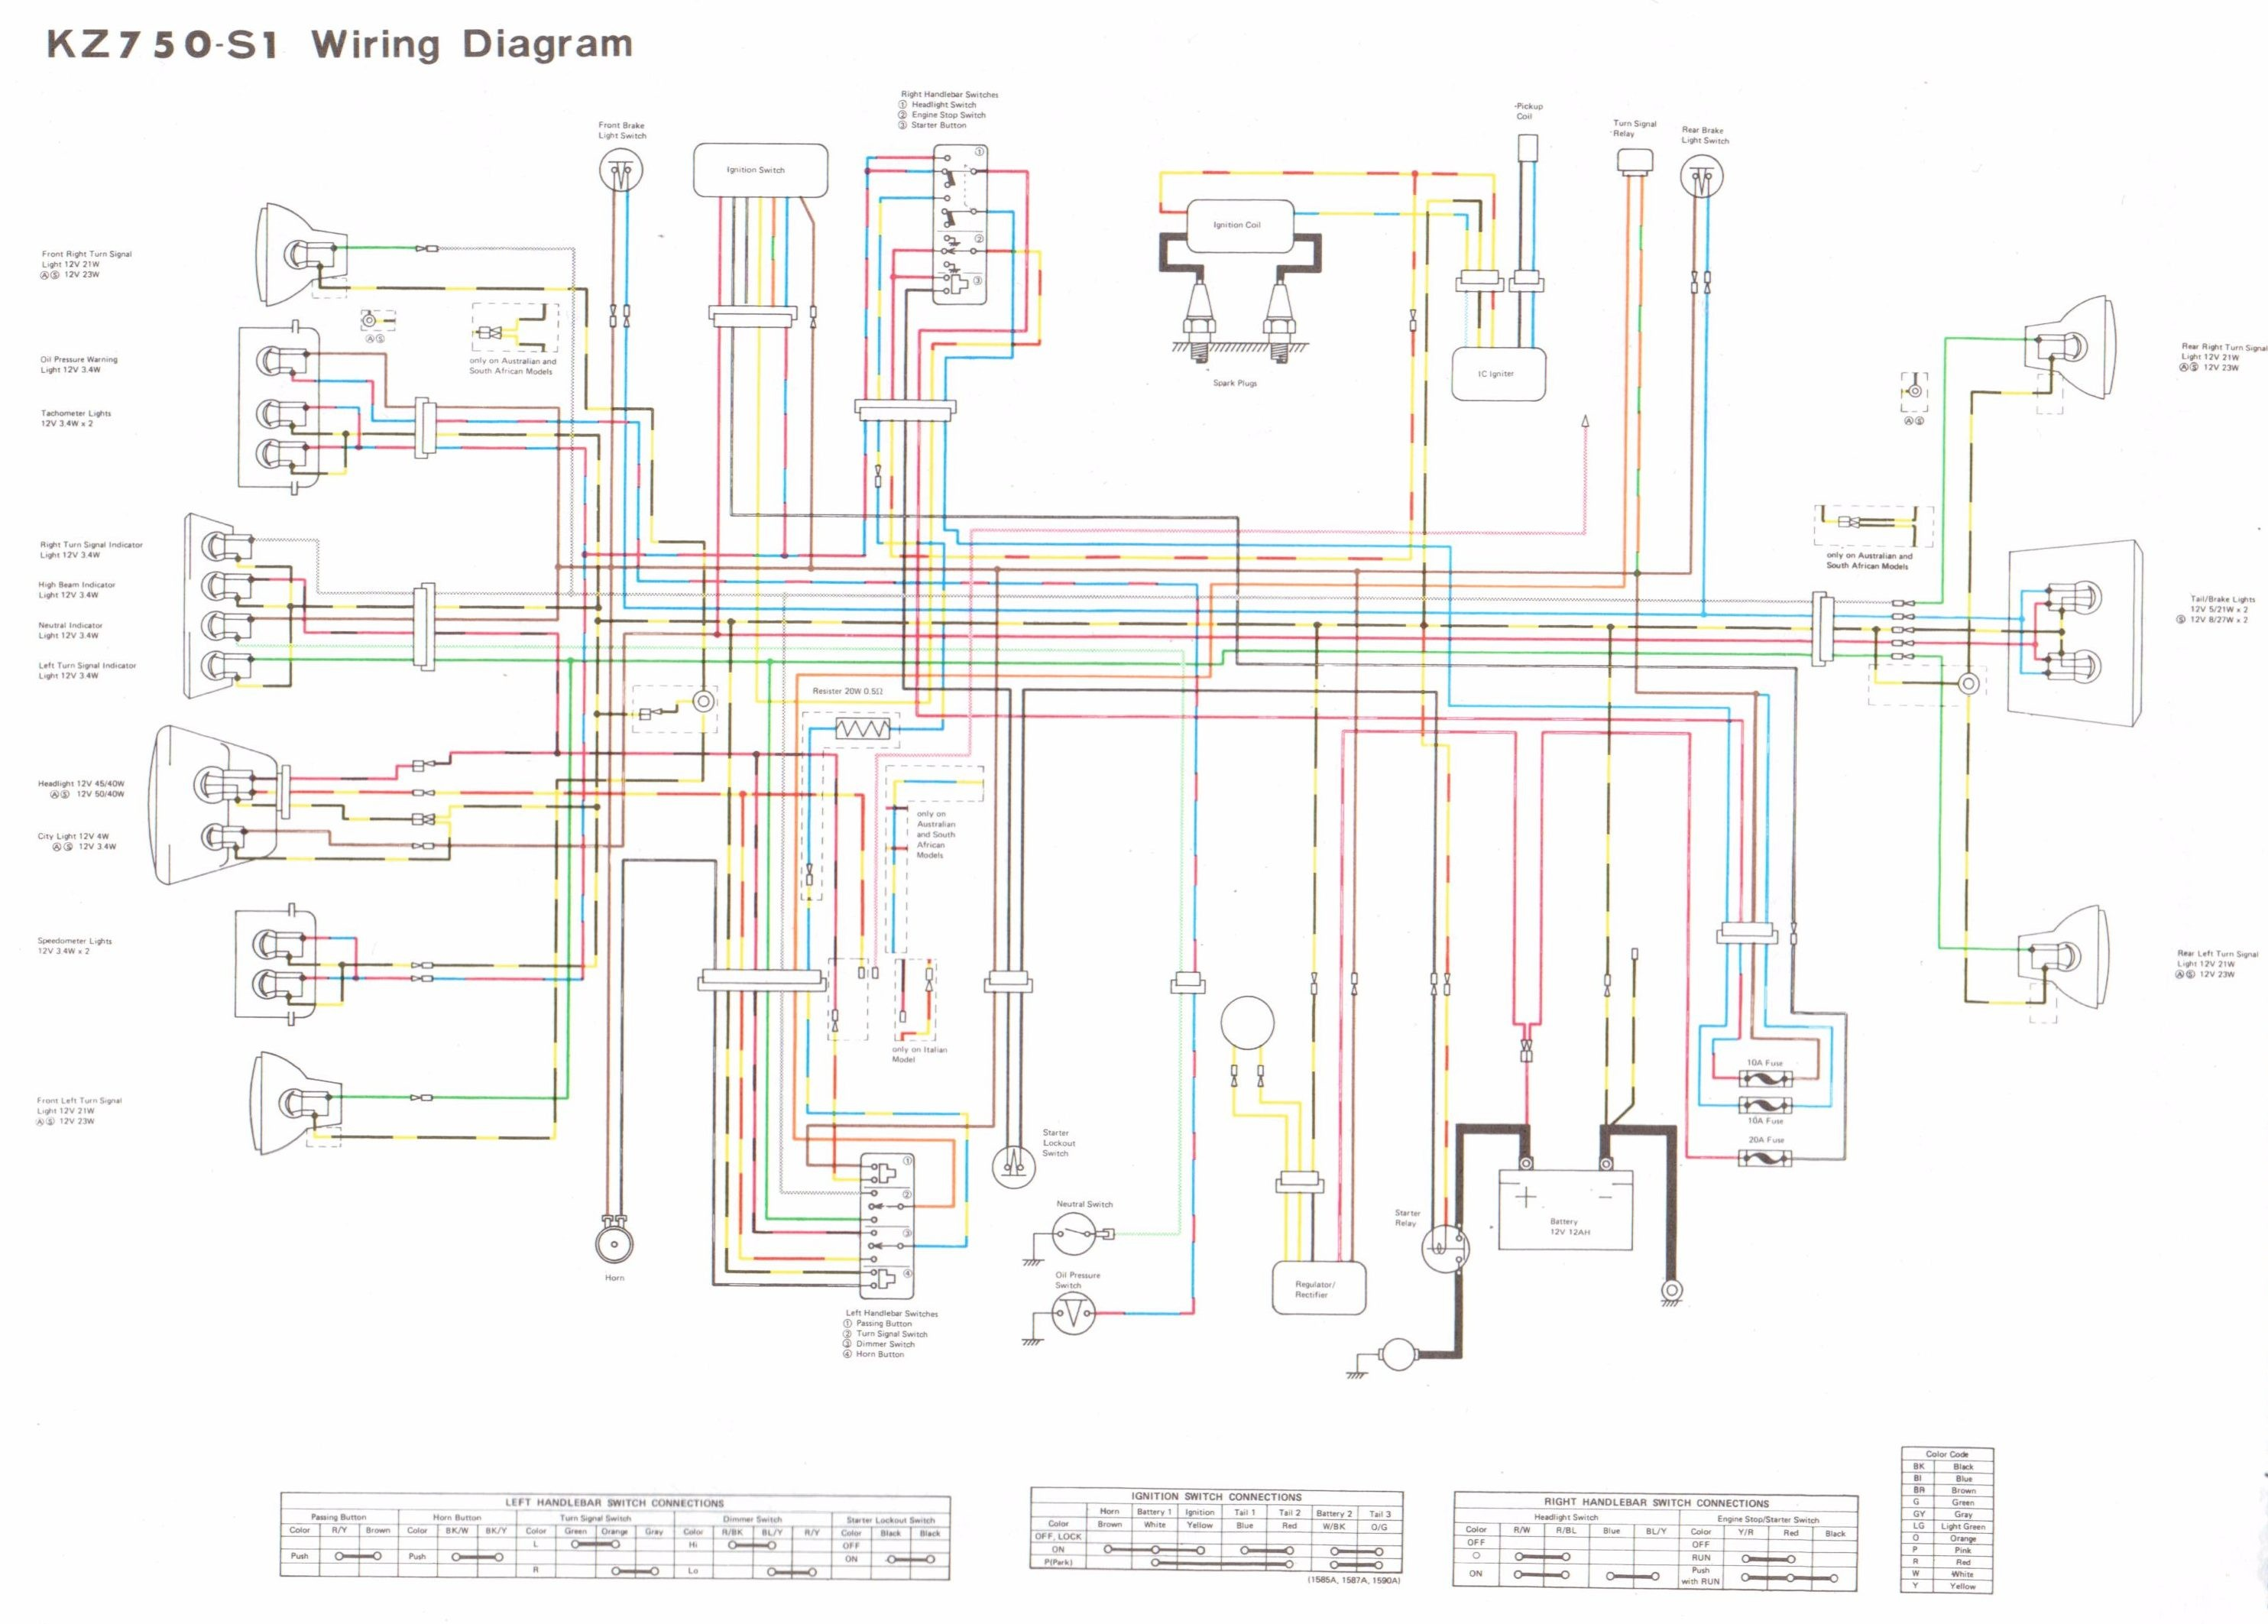 Maxxforce 13 Engine Sensor Harness Diagram Schema] Renault Media Nav Evolution User Wiring Diagram Full Of Maxxforce 13 Engine Sensor Harness Diagram